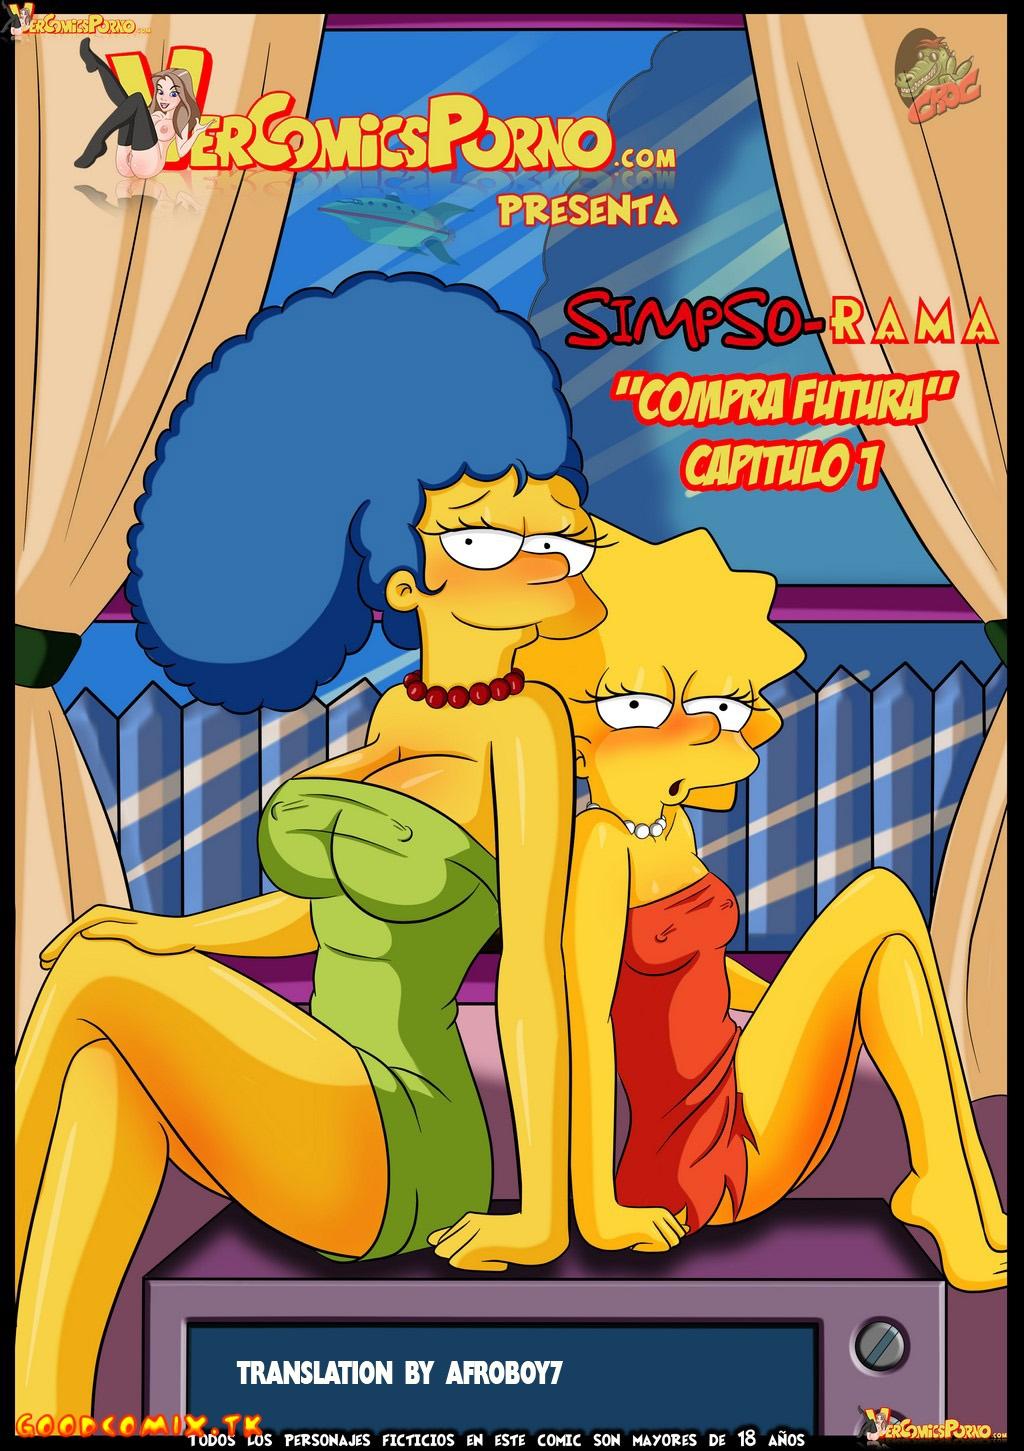 Goodcomix The Simpsons - [Croc] - SimpsoRama - Simpso-Rama - Capitulo 1 Compra Futura 1